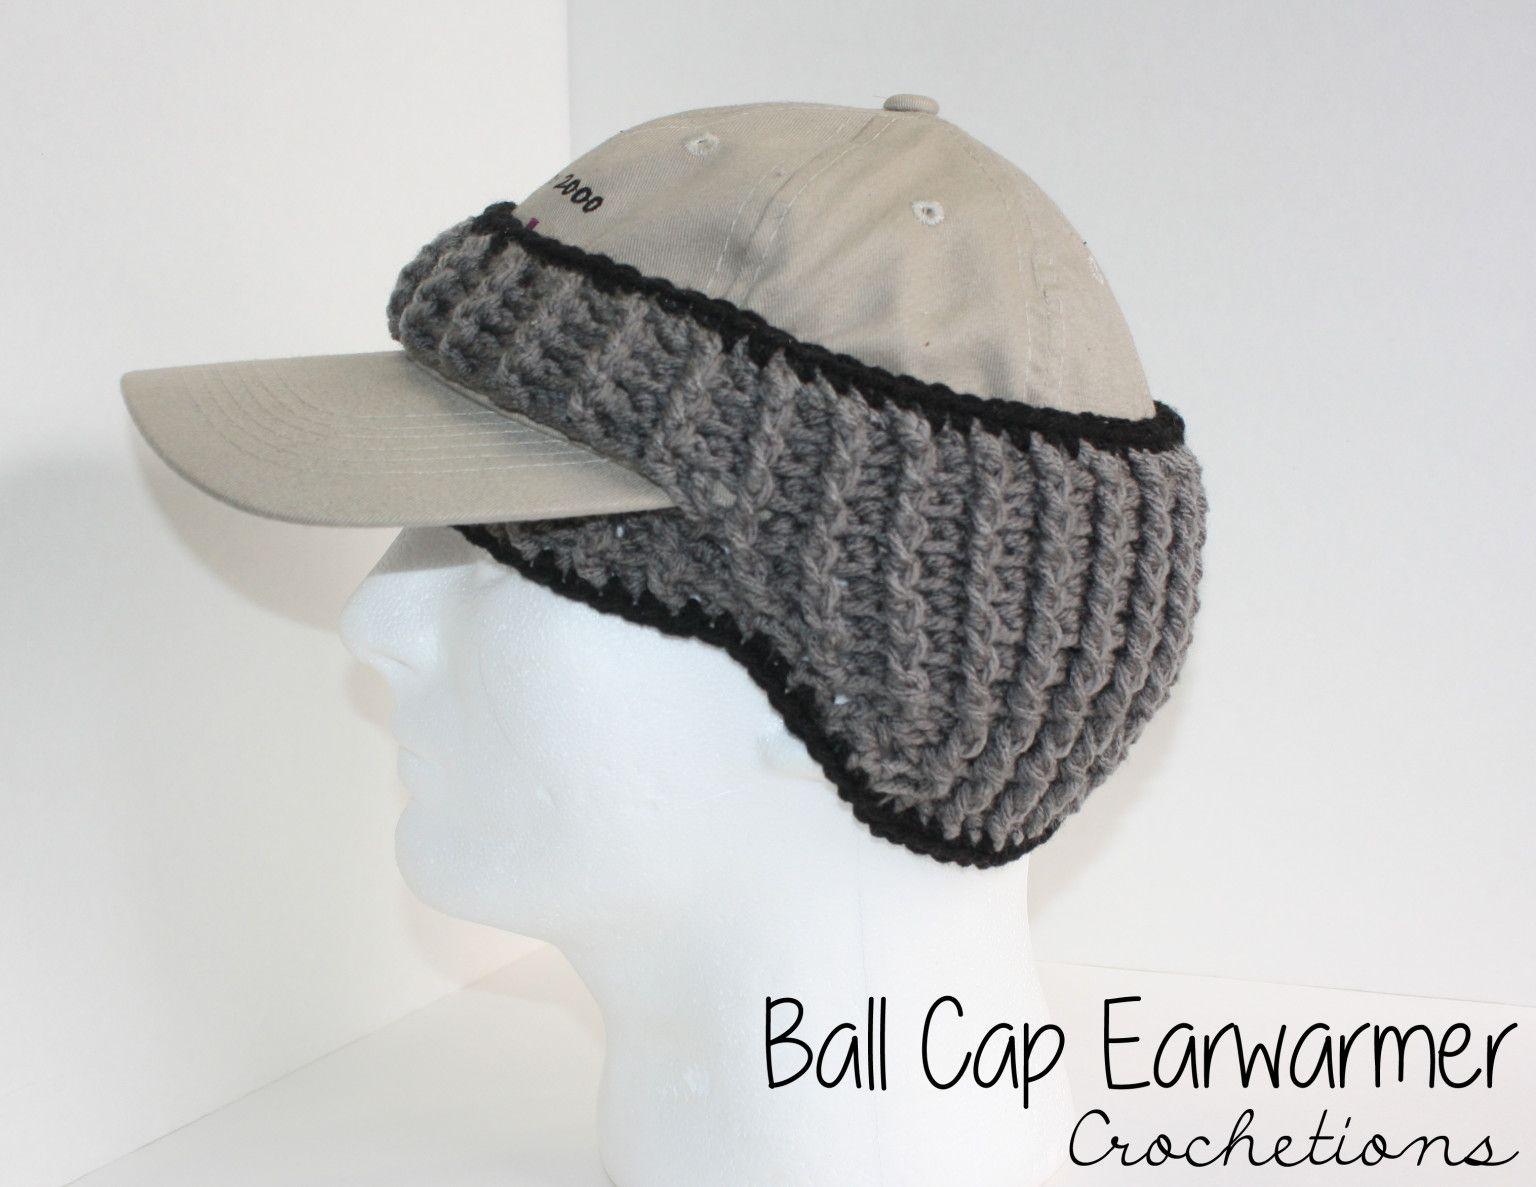 Handmade crochet headband for ball cap wearers! Great for winter ...